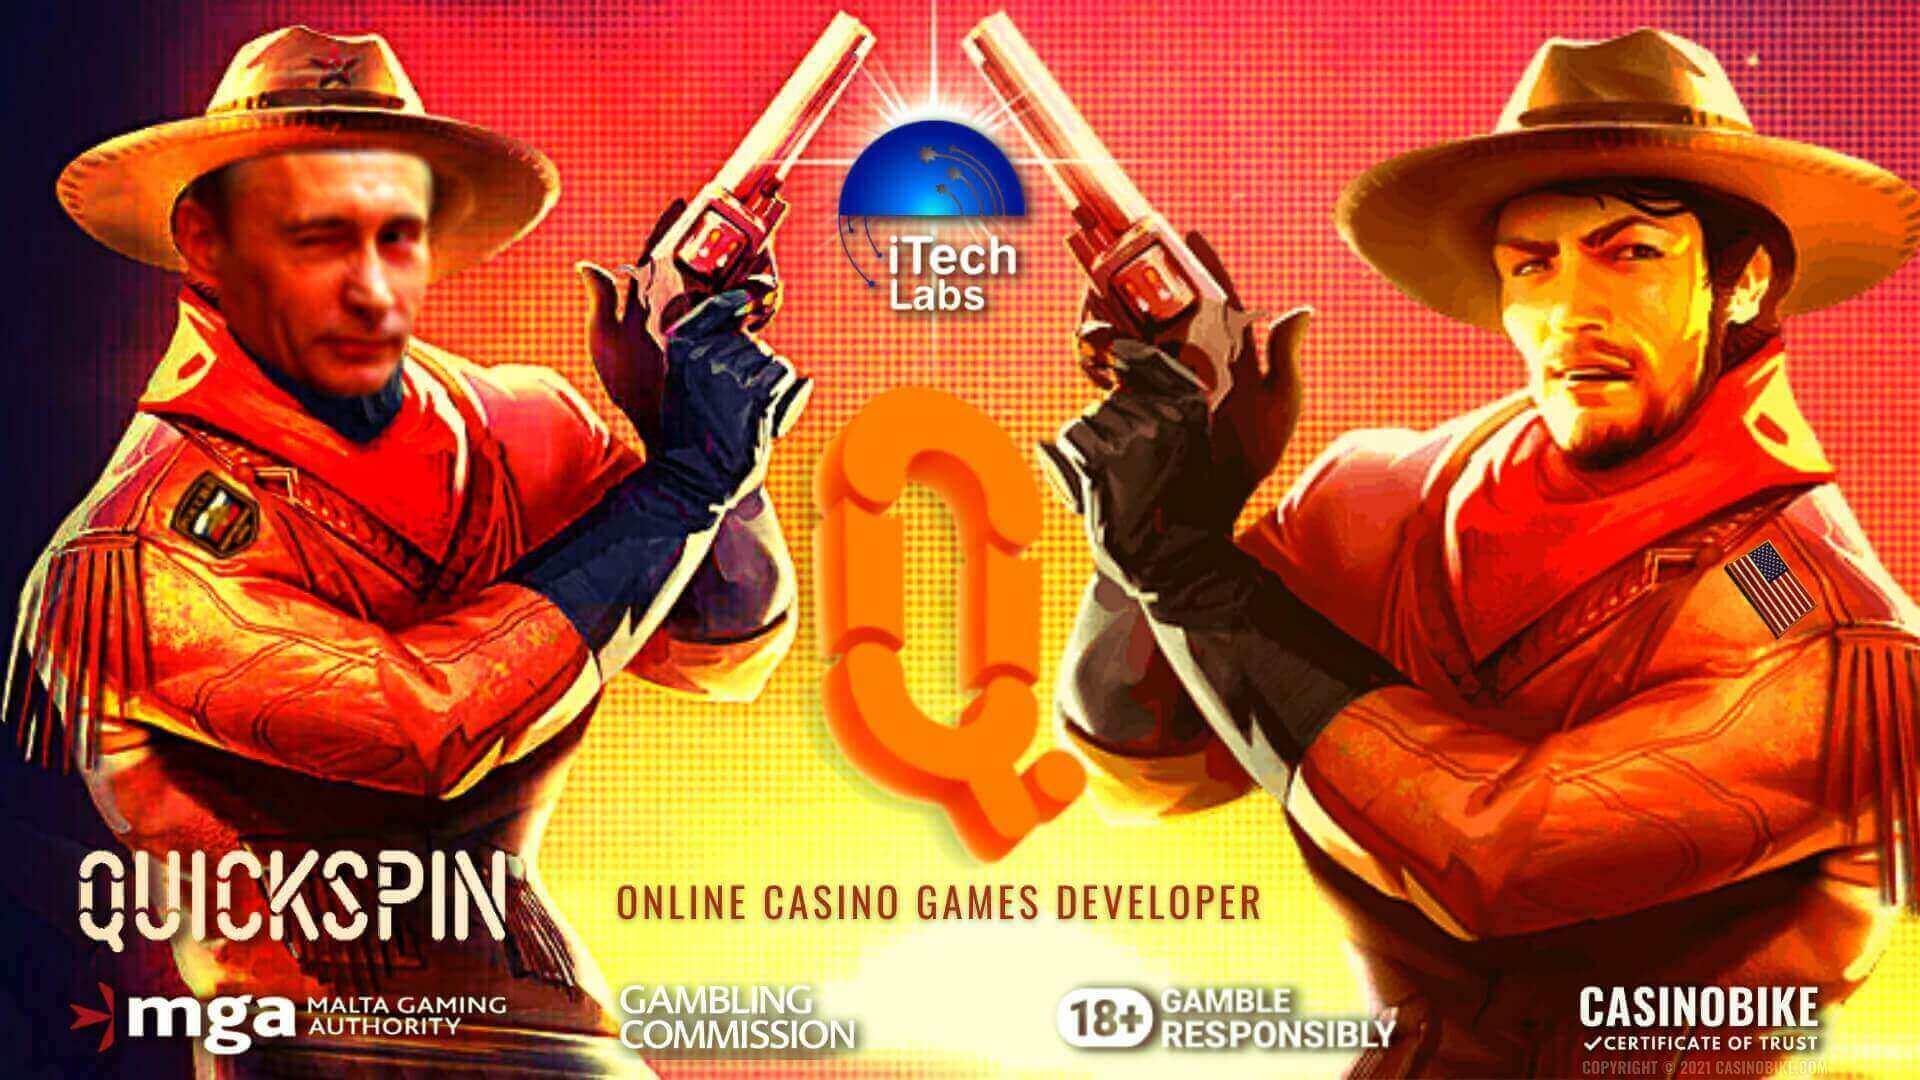 Quickspin Online Casino Games Developer